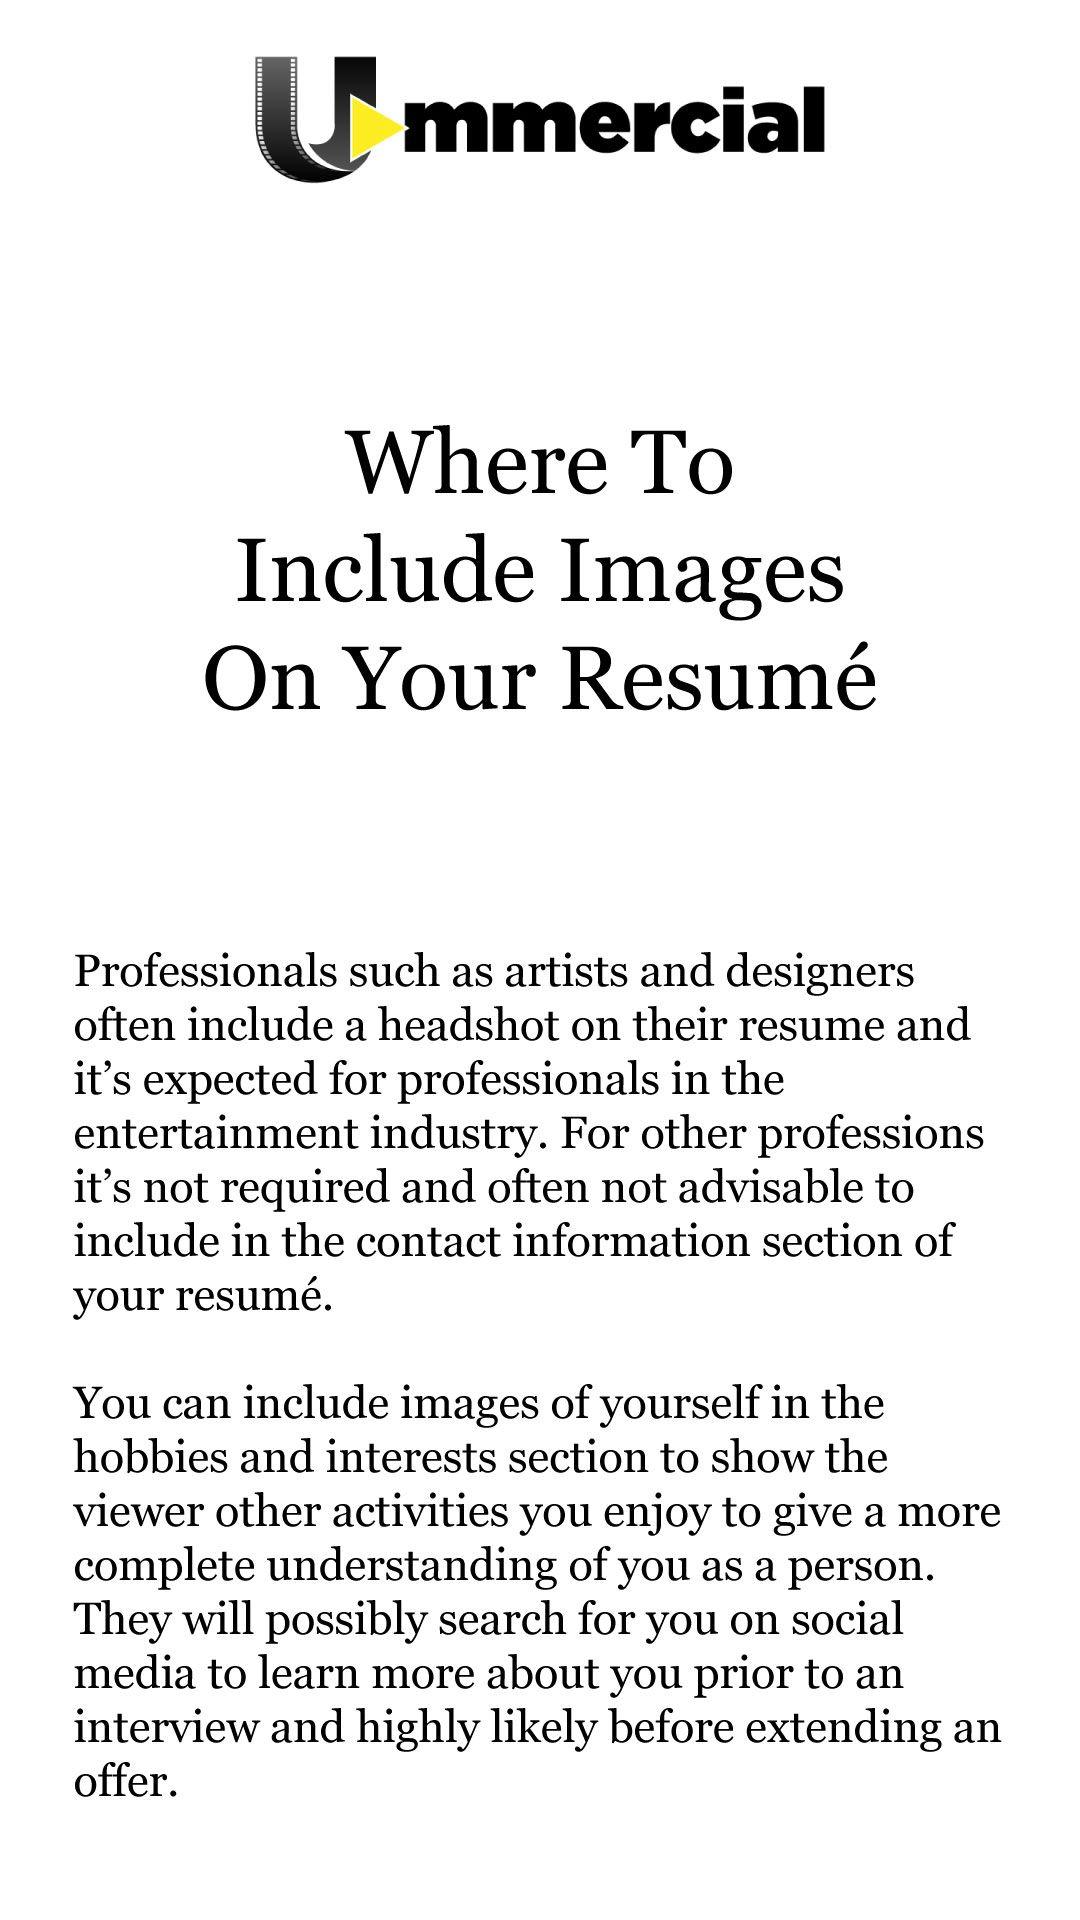 Send Us Your Resume For A Free Evaluation To Sample Ummercial Com